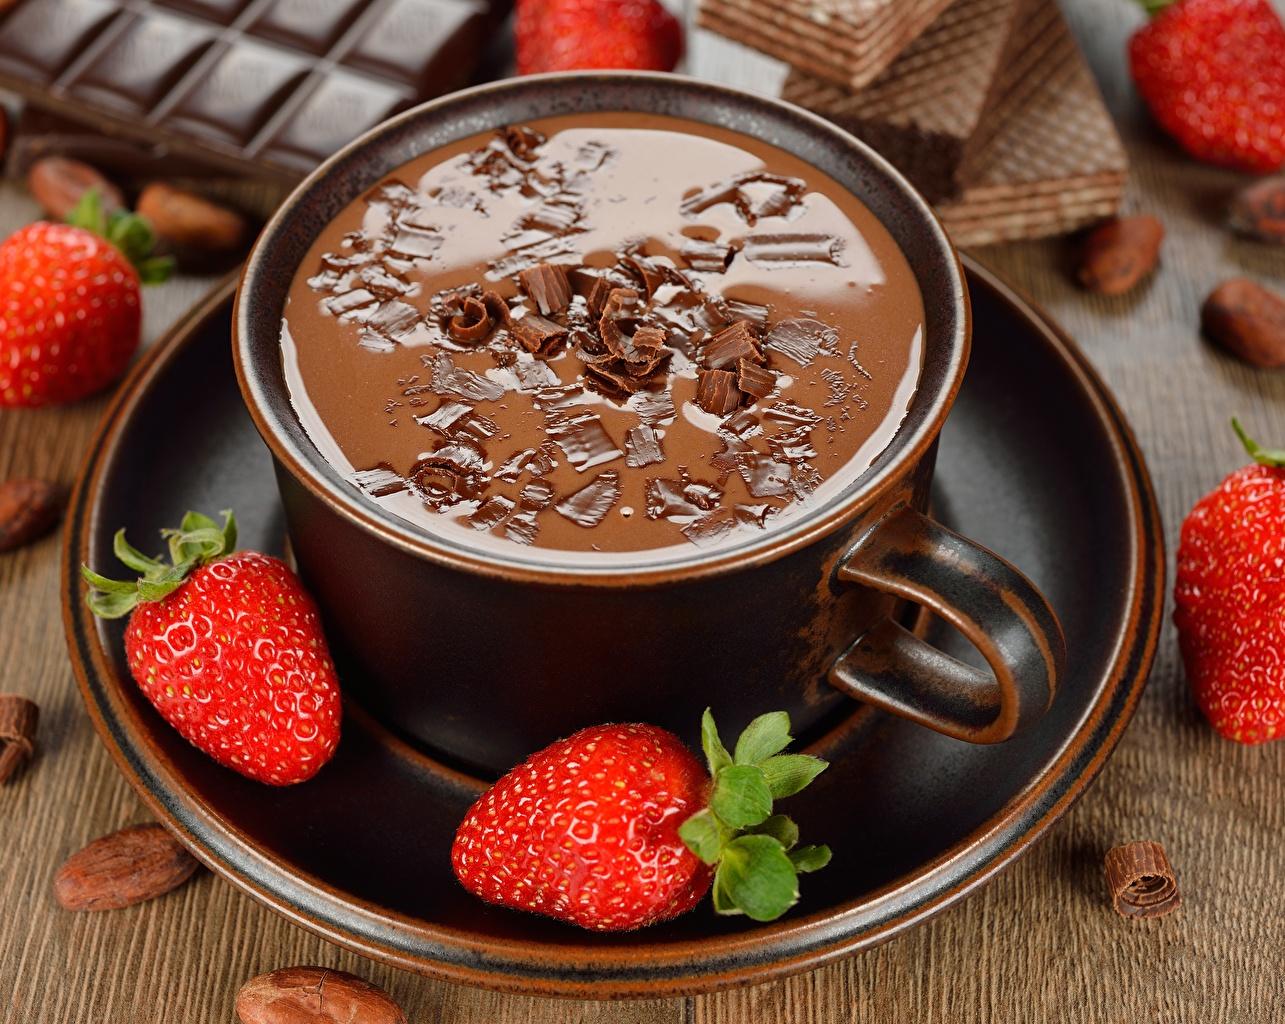 Photos Goryachiy Shokolad Strawberry Cup Food Saucer